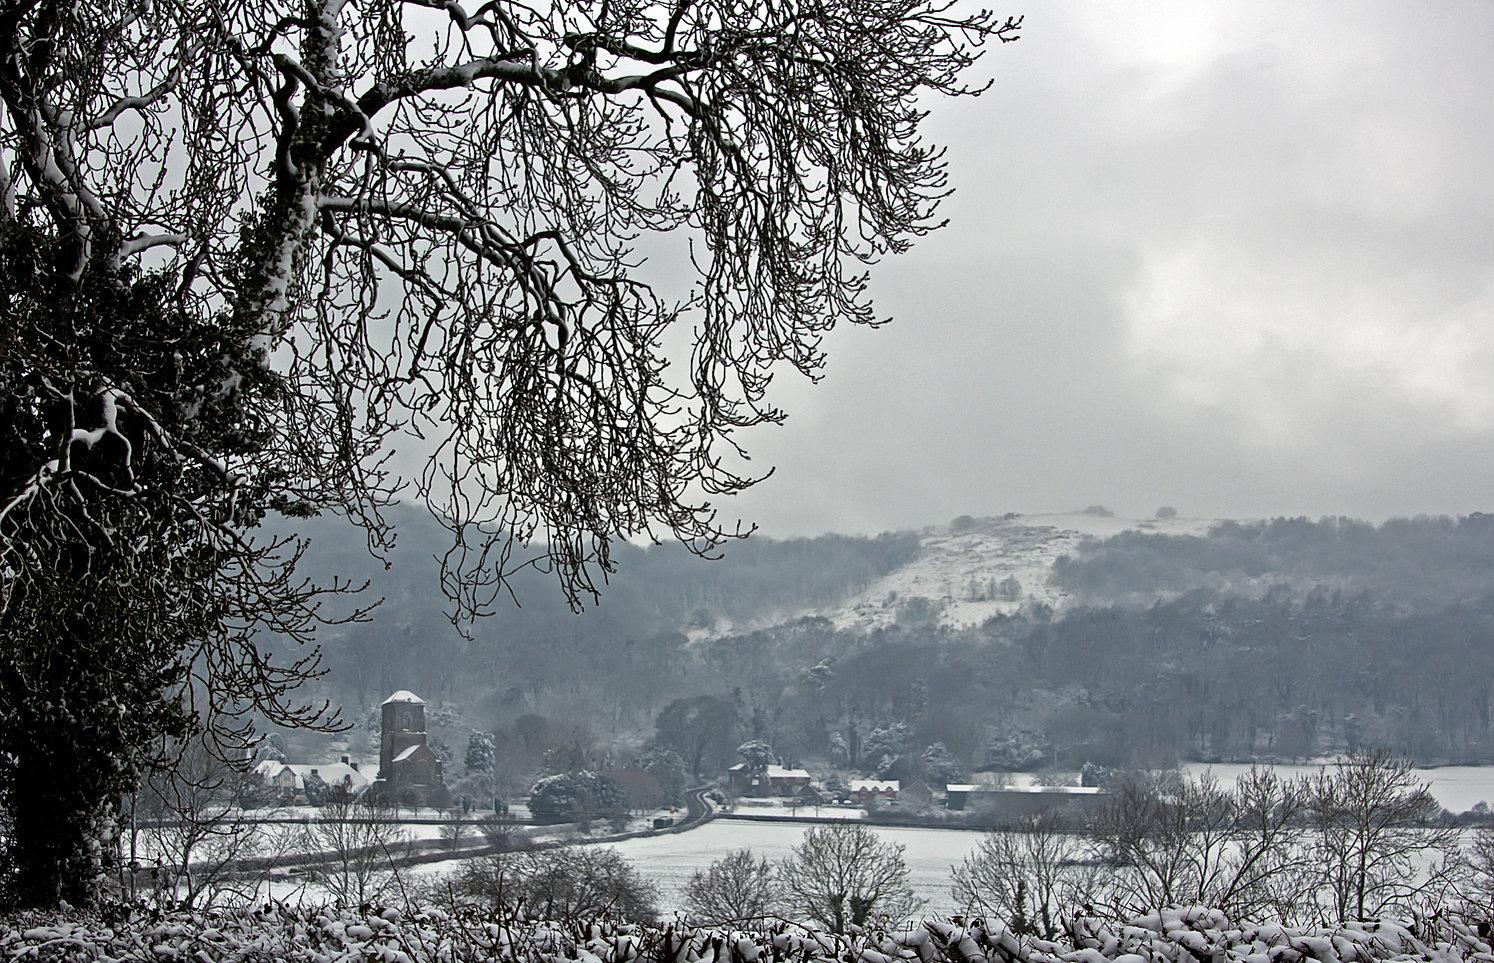 ron milsom photographe landscape